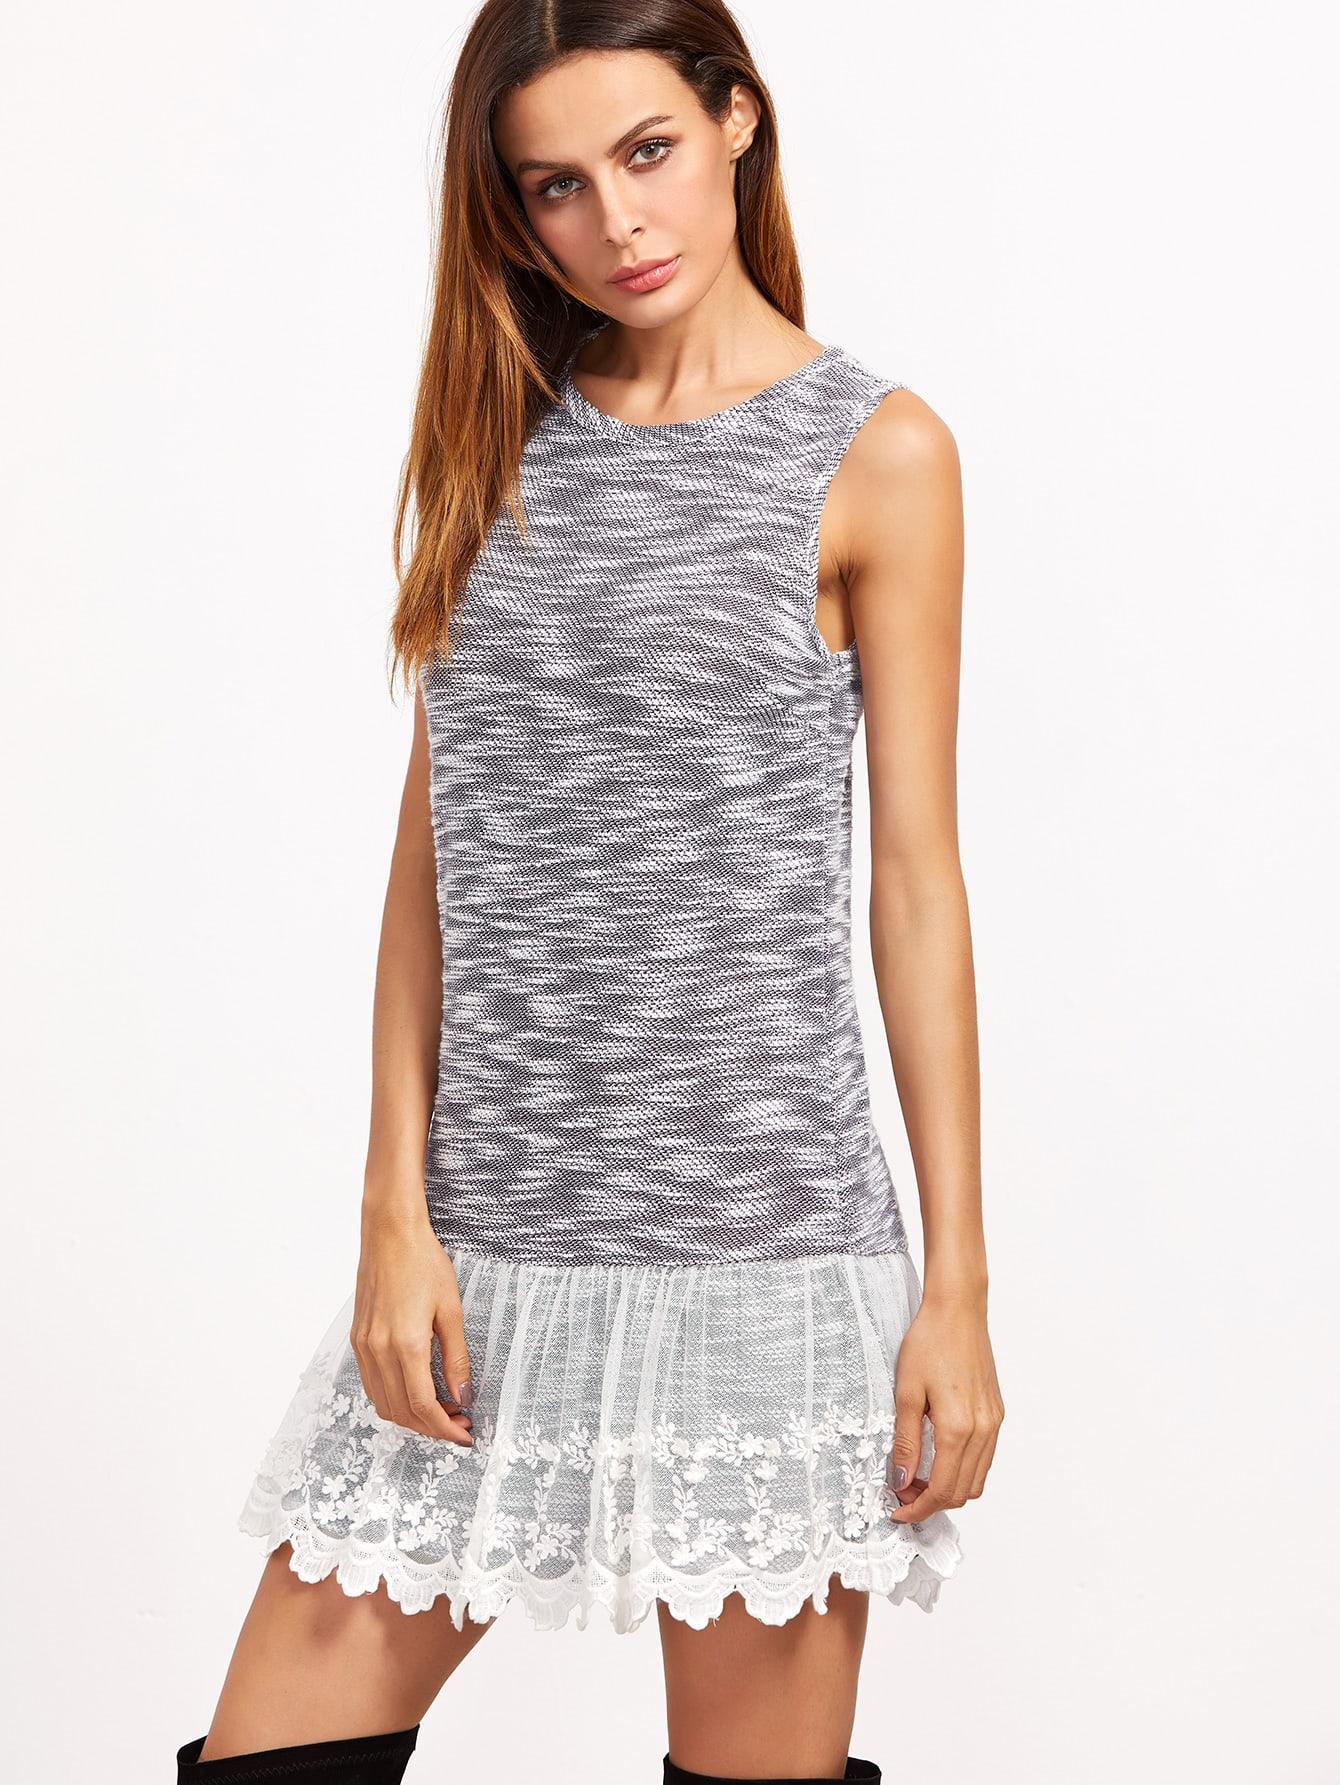 Grey Marled Contrast Lace Trim Tank Dress dress161123719